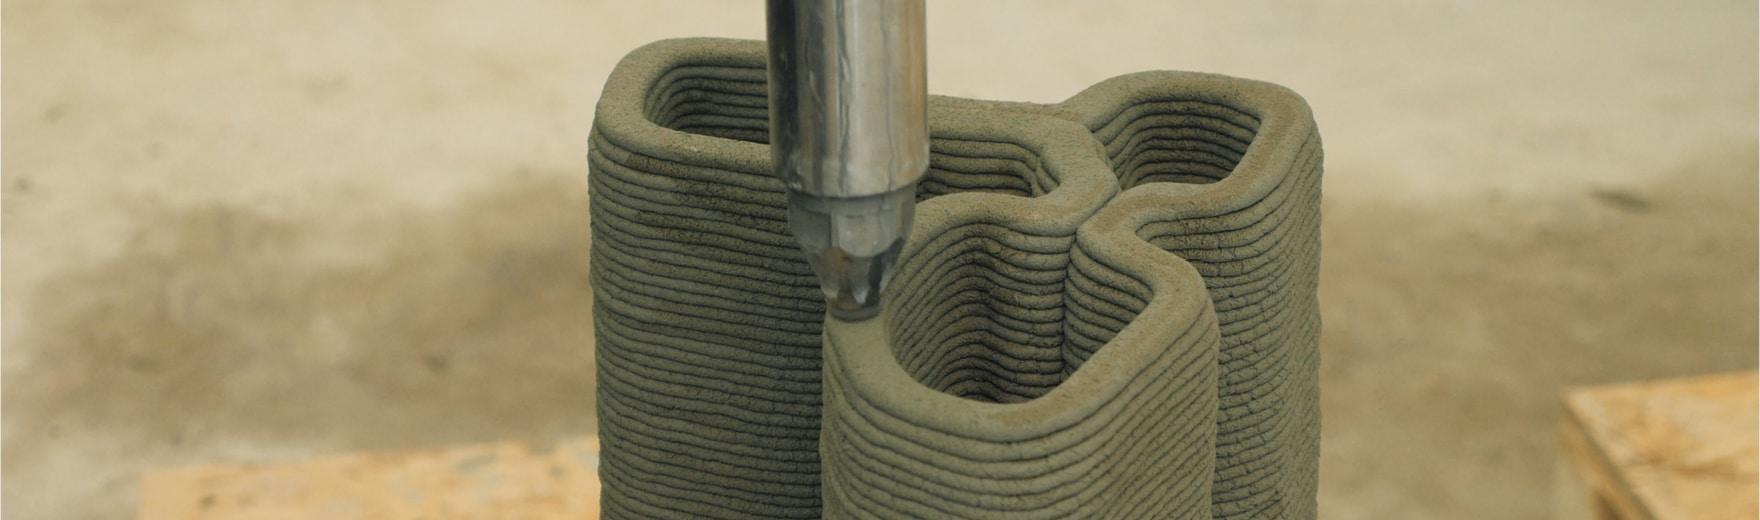 Impression 3D béton Lafarge